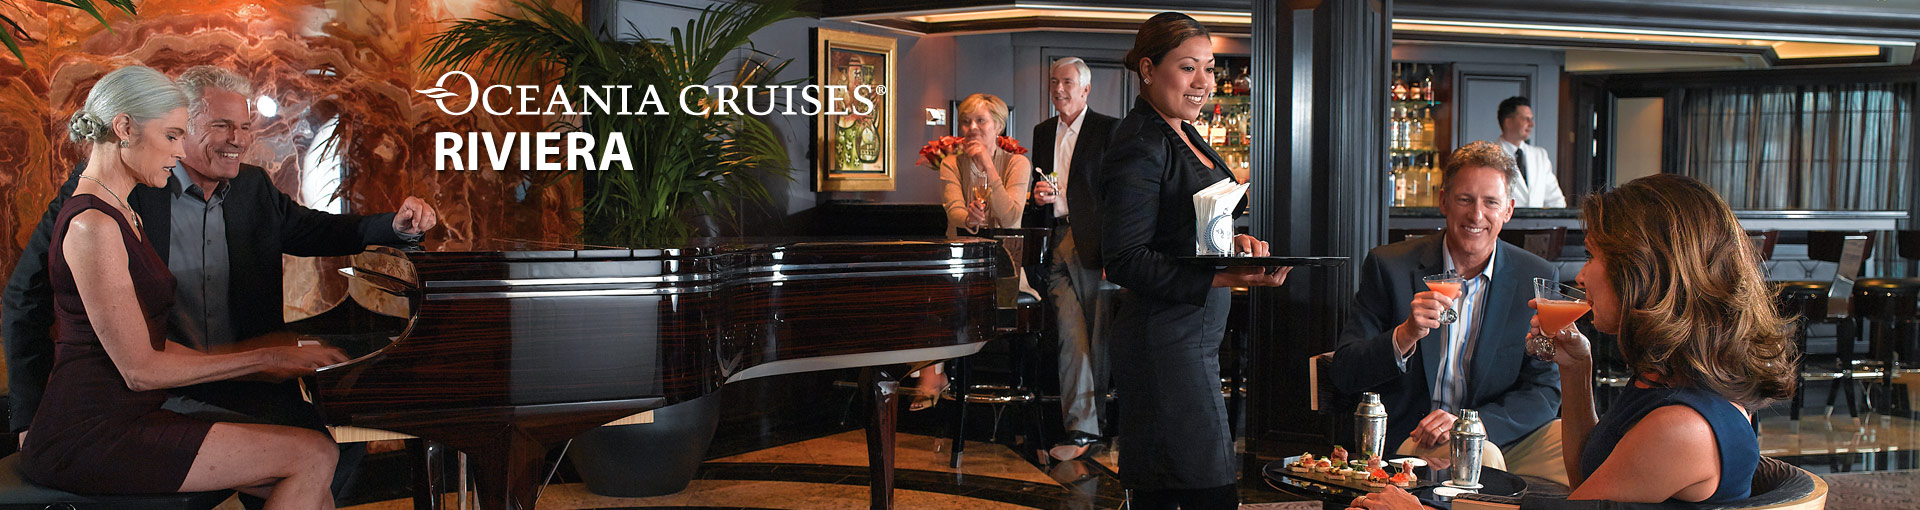 Oceania Riviera cruise ship